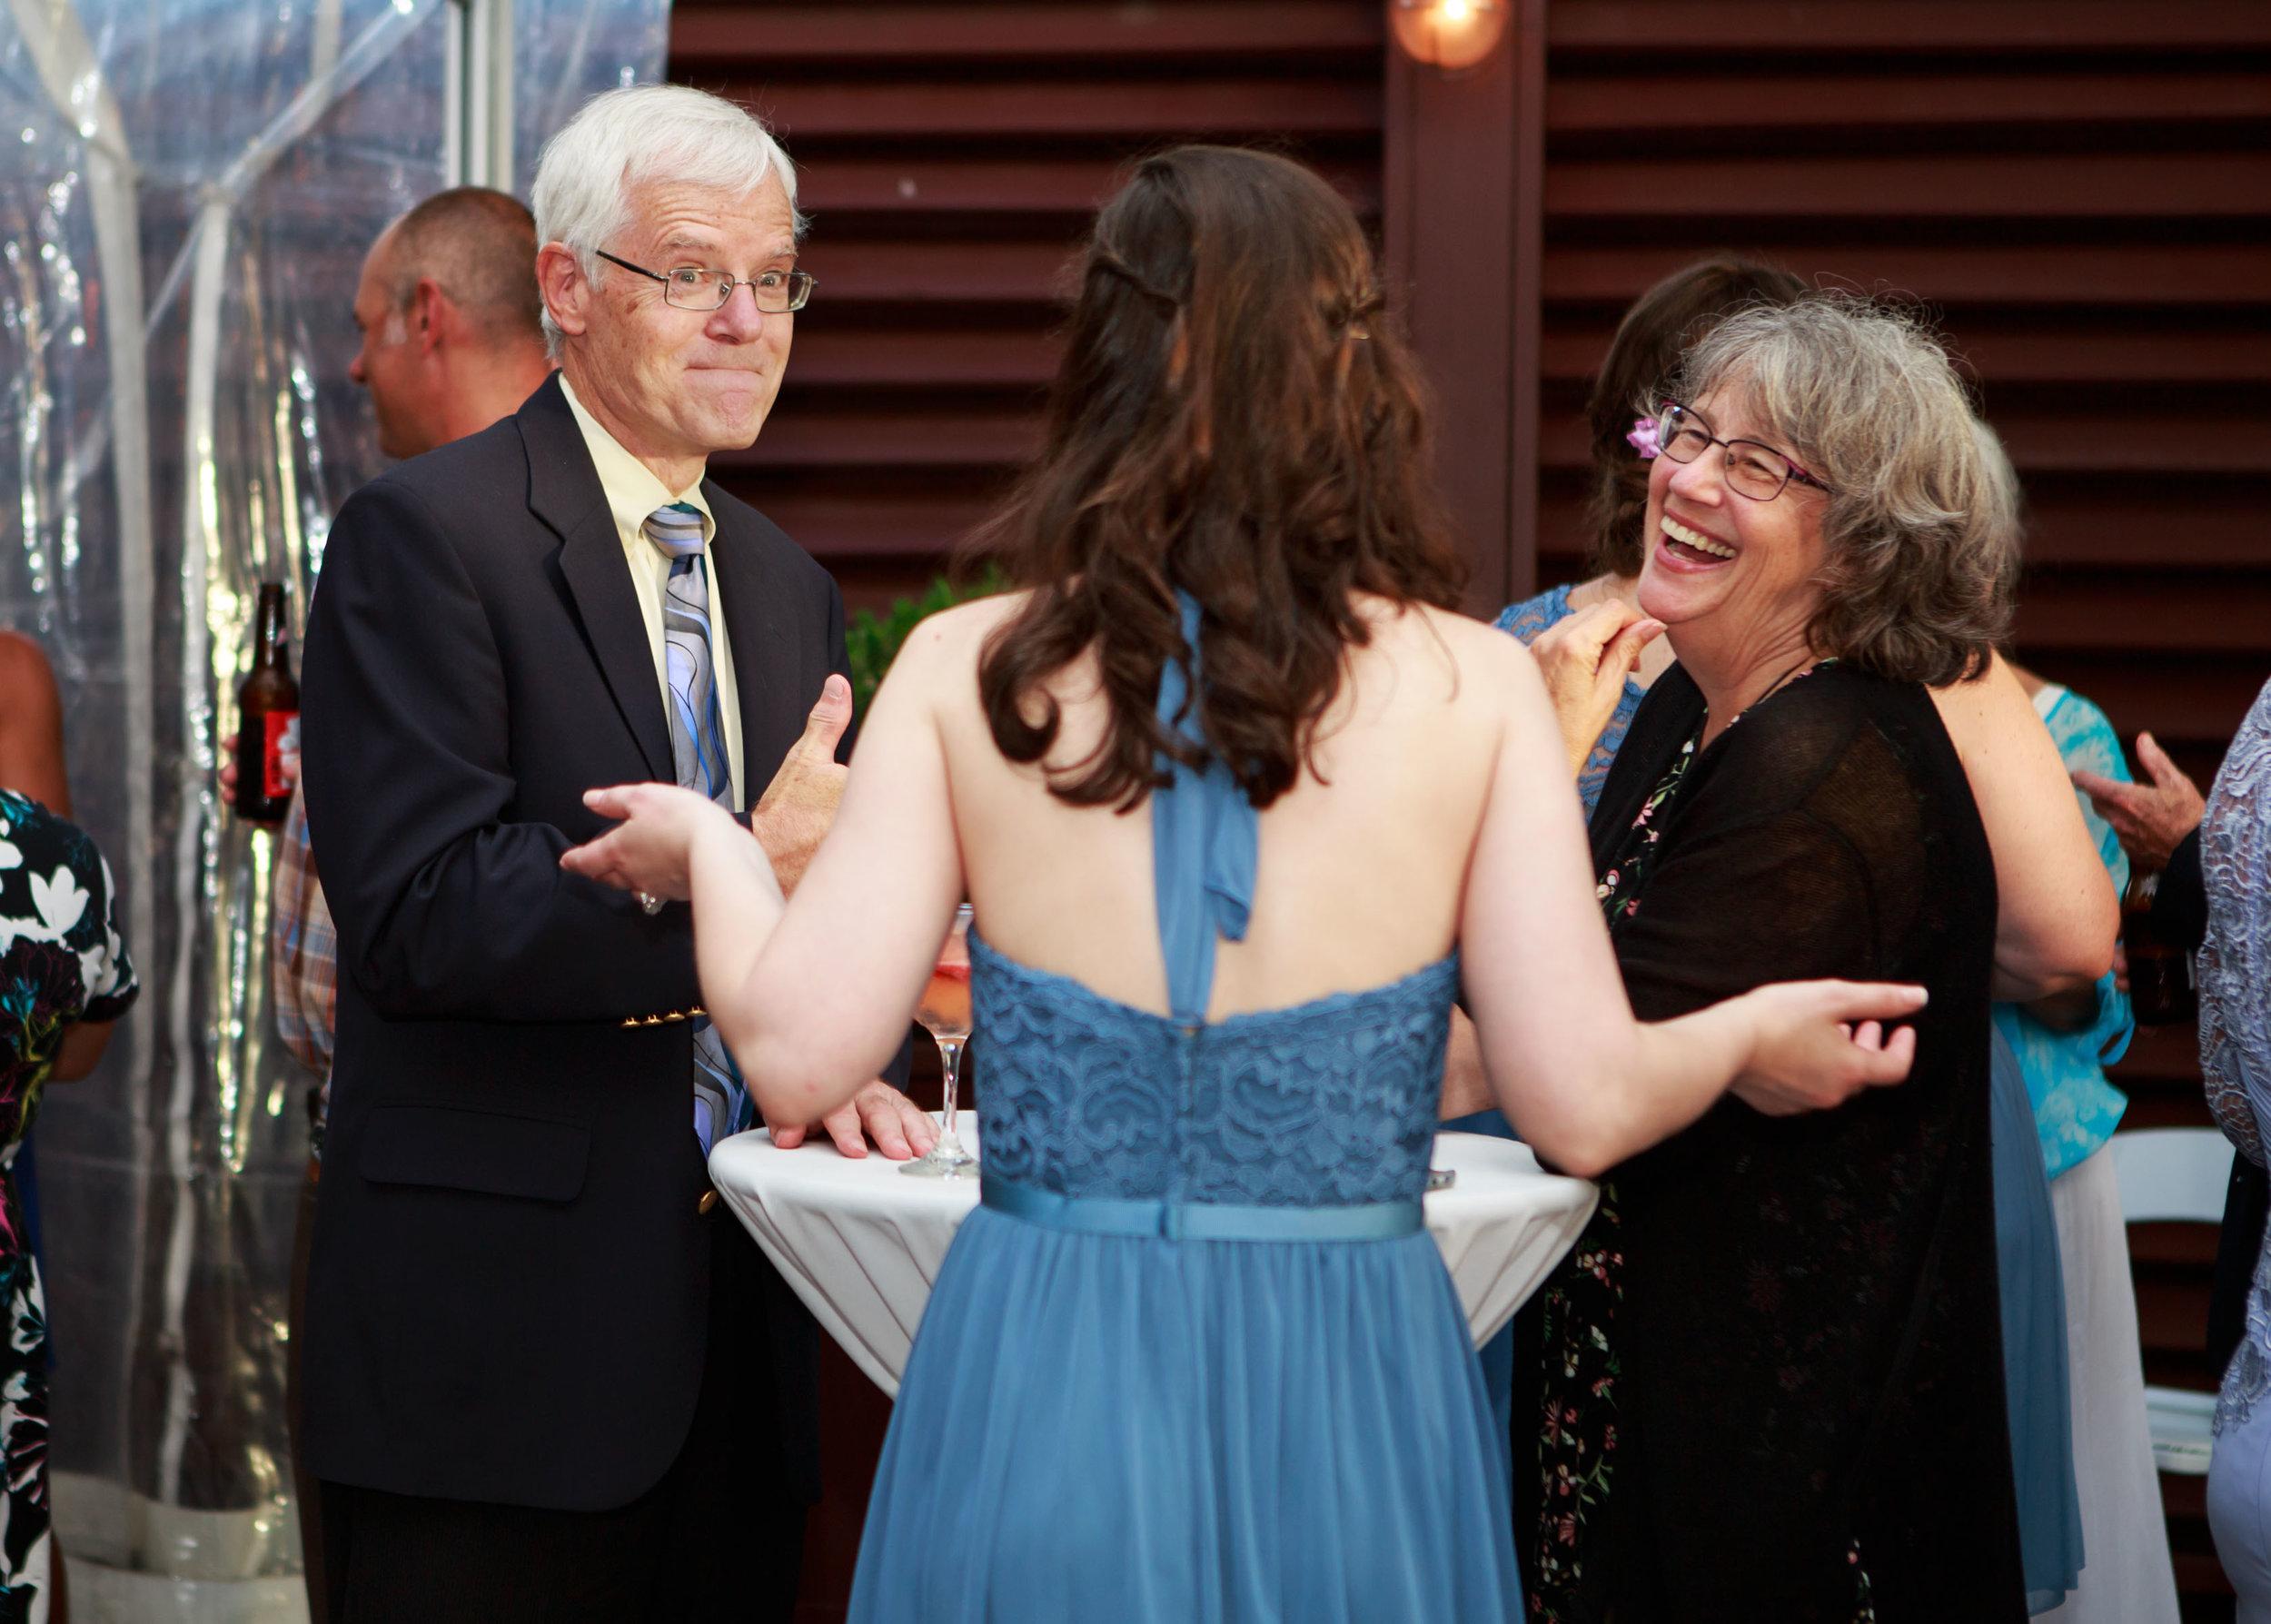 128-South-Wedding-Wilmington-NC-Photographer-Reception-66.jpg